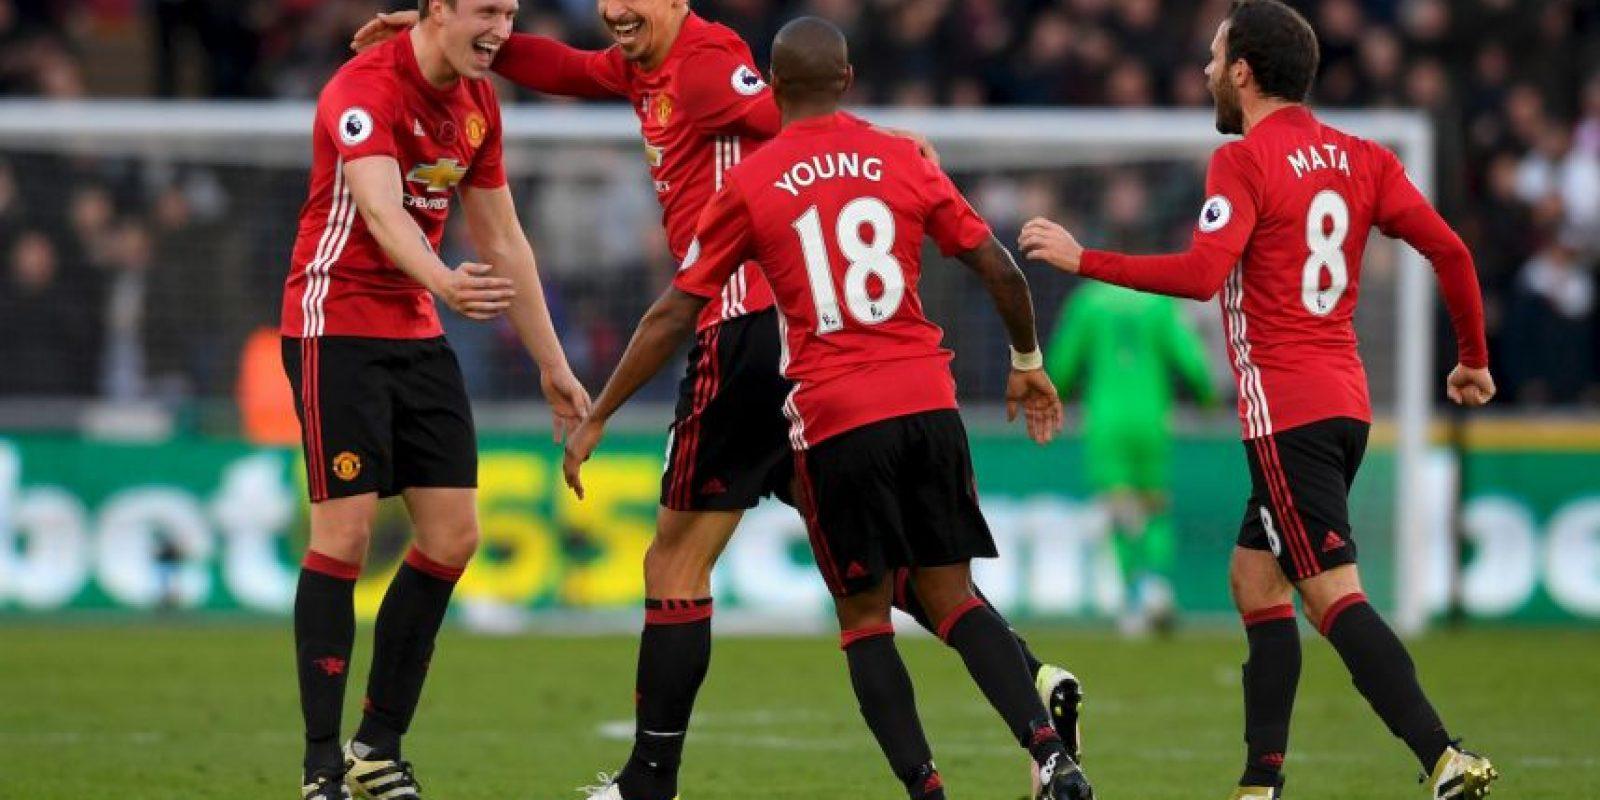 4.- Manchester United (Premier League) – 7,616,400 millones de dólares de sueldo anual en promedio Foto:Getty Images